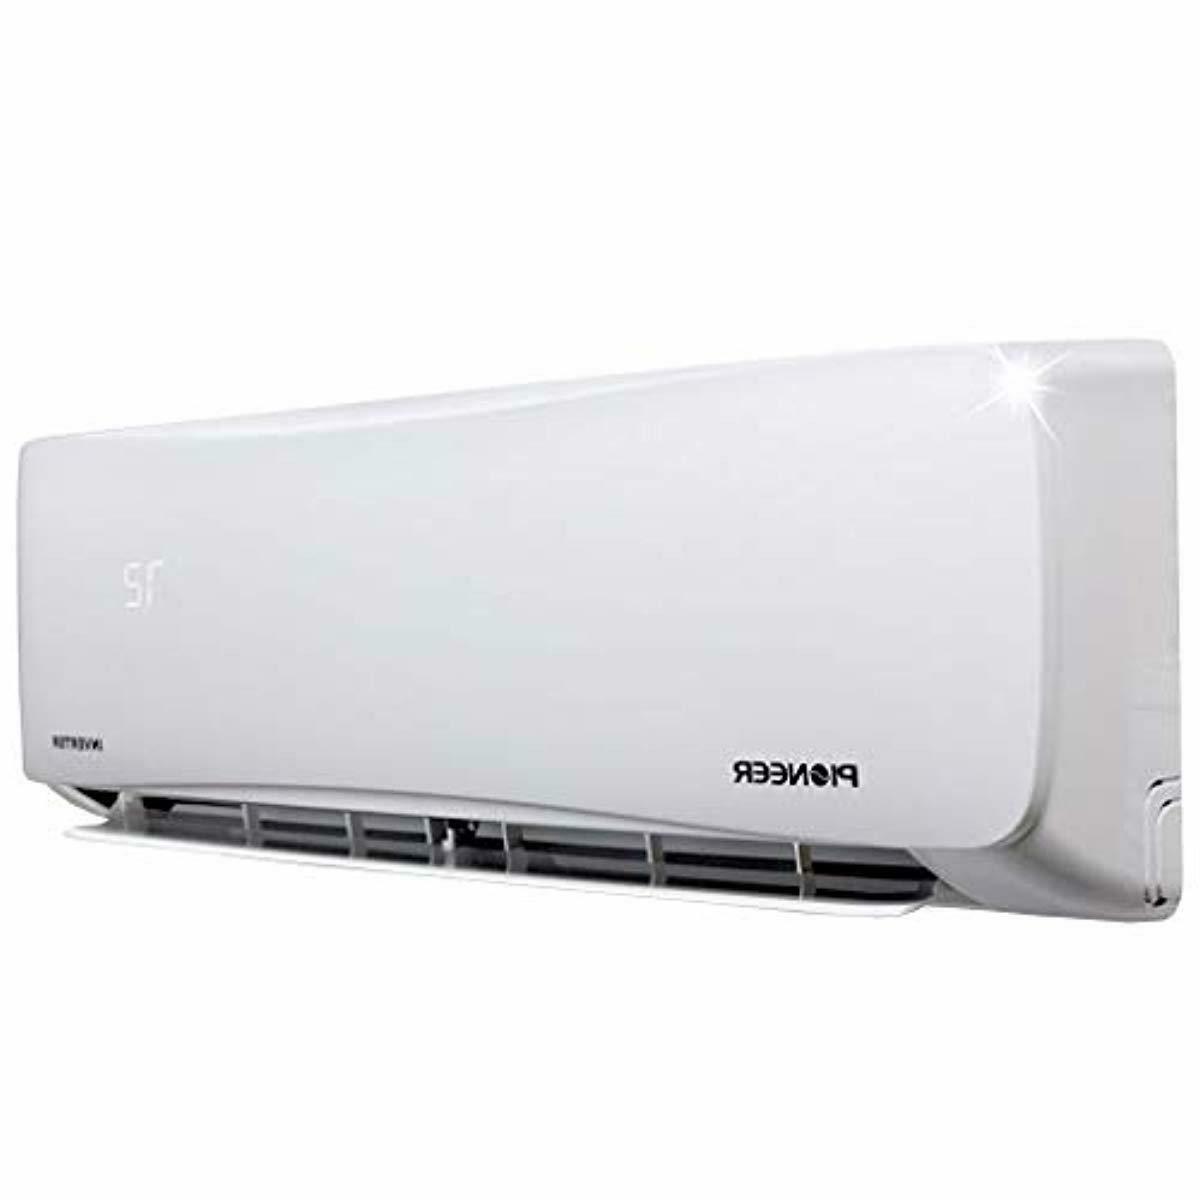 PIONEER Air Conditioner Mini Heat Minisplit Heatpump BT